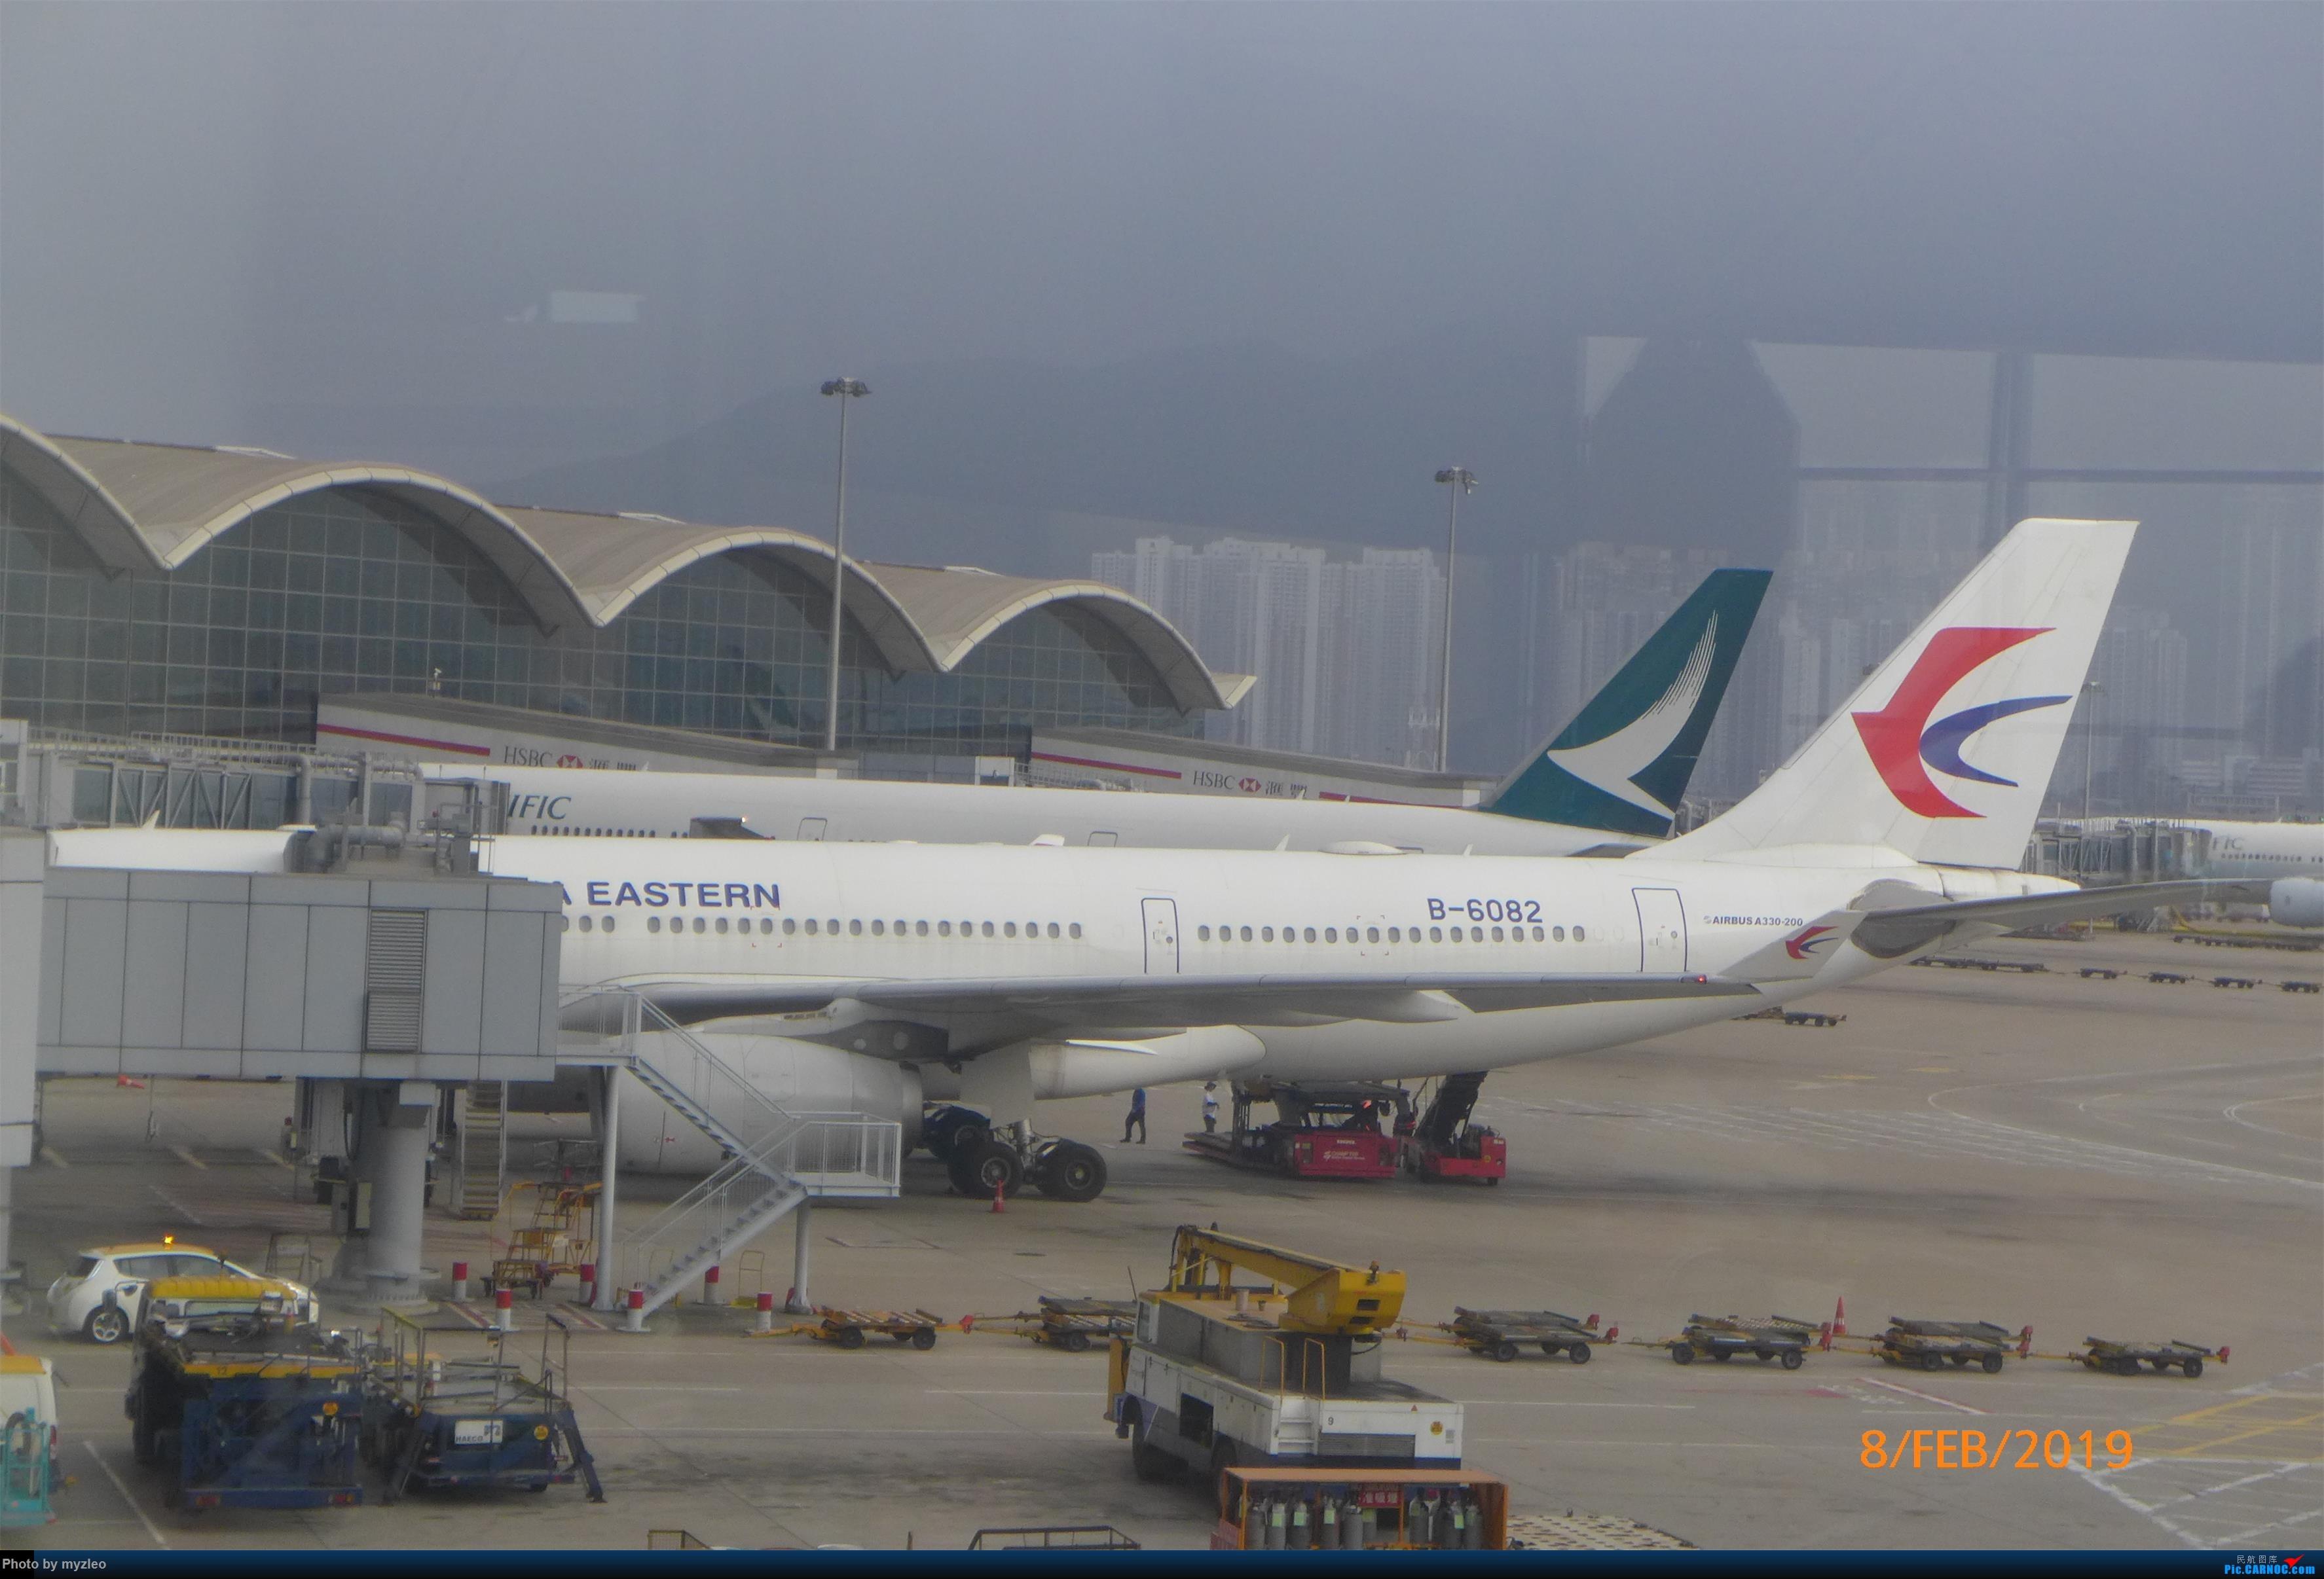 Re:[原创]【myzleo的游记4.5】十年之约(5)在香港的最后一天,搭乘港航333回沪 AIRBUS A330-200 B-6082 中国香港国际机场